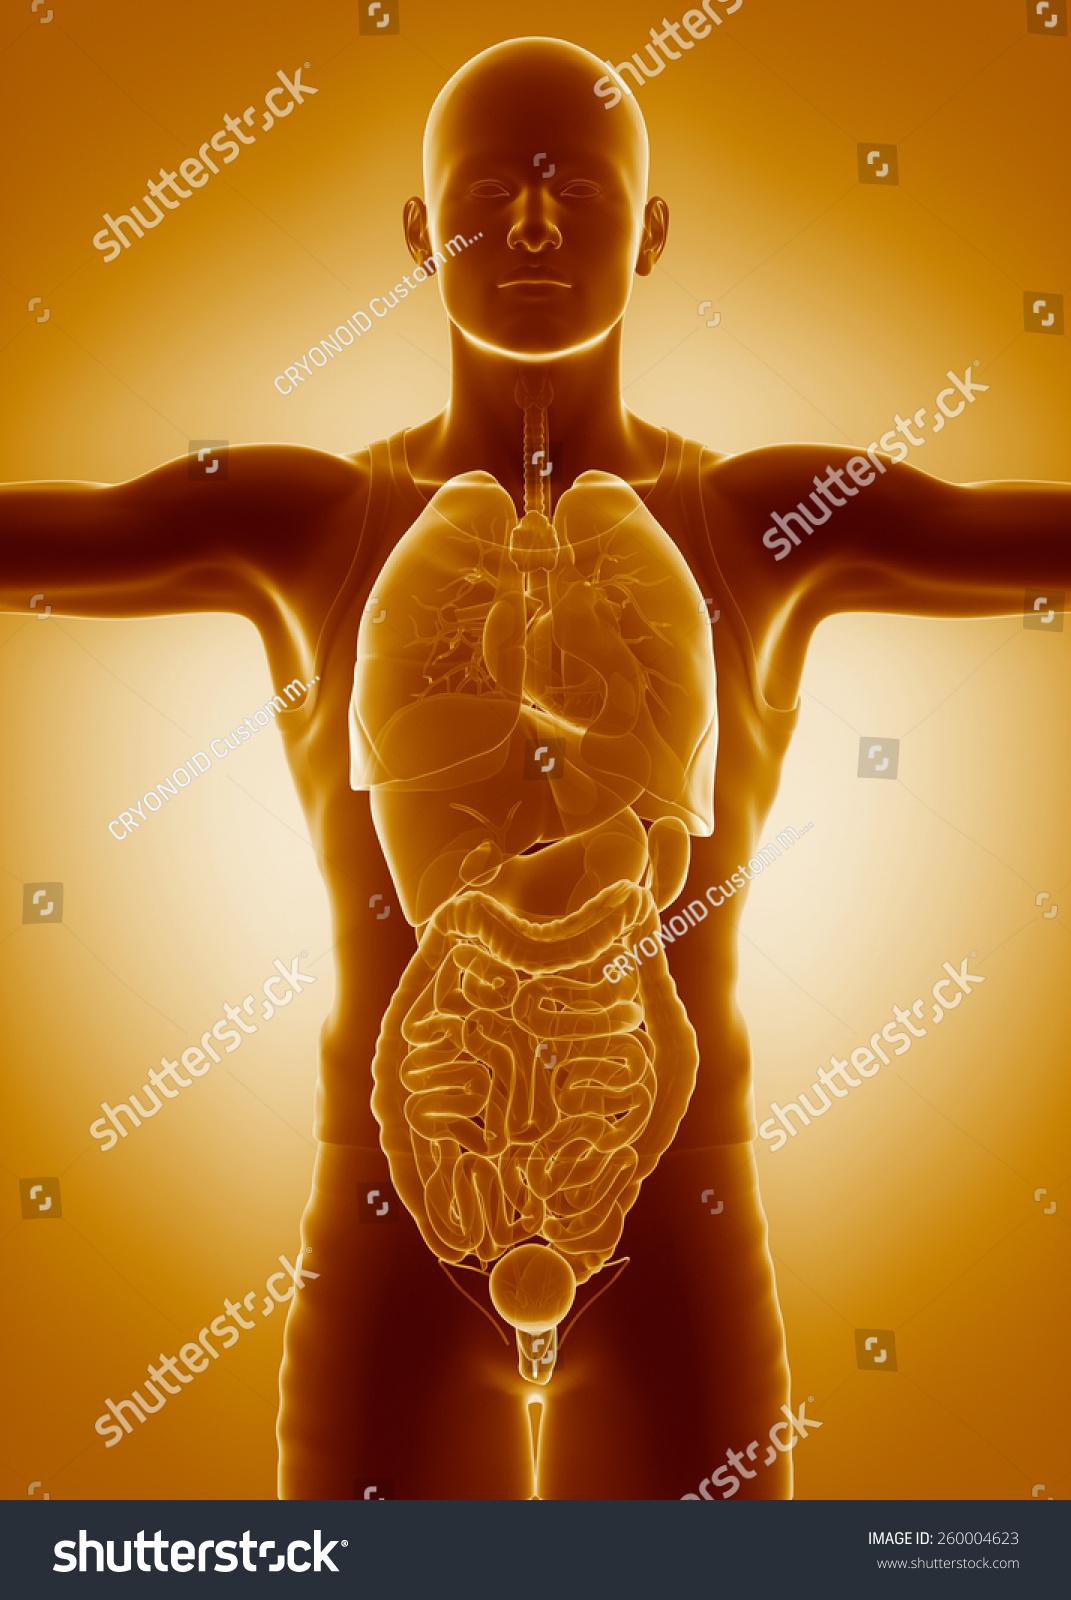 Medical Anatomy Scan ORGANS Stock Illustration 260004623 - Shutterstock